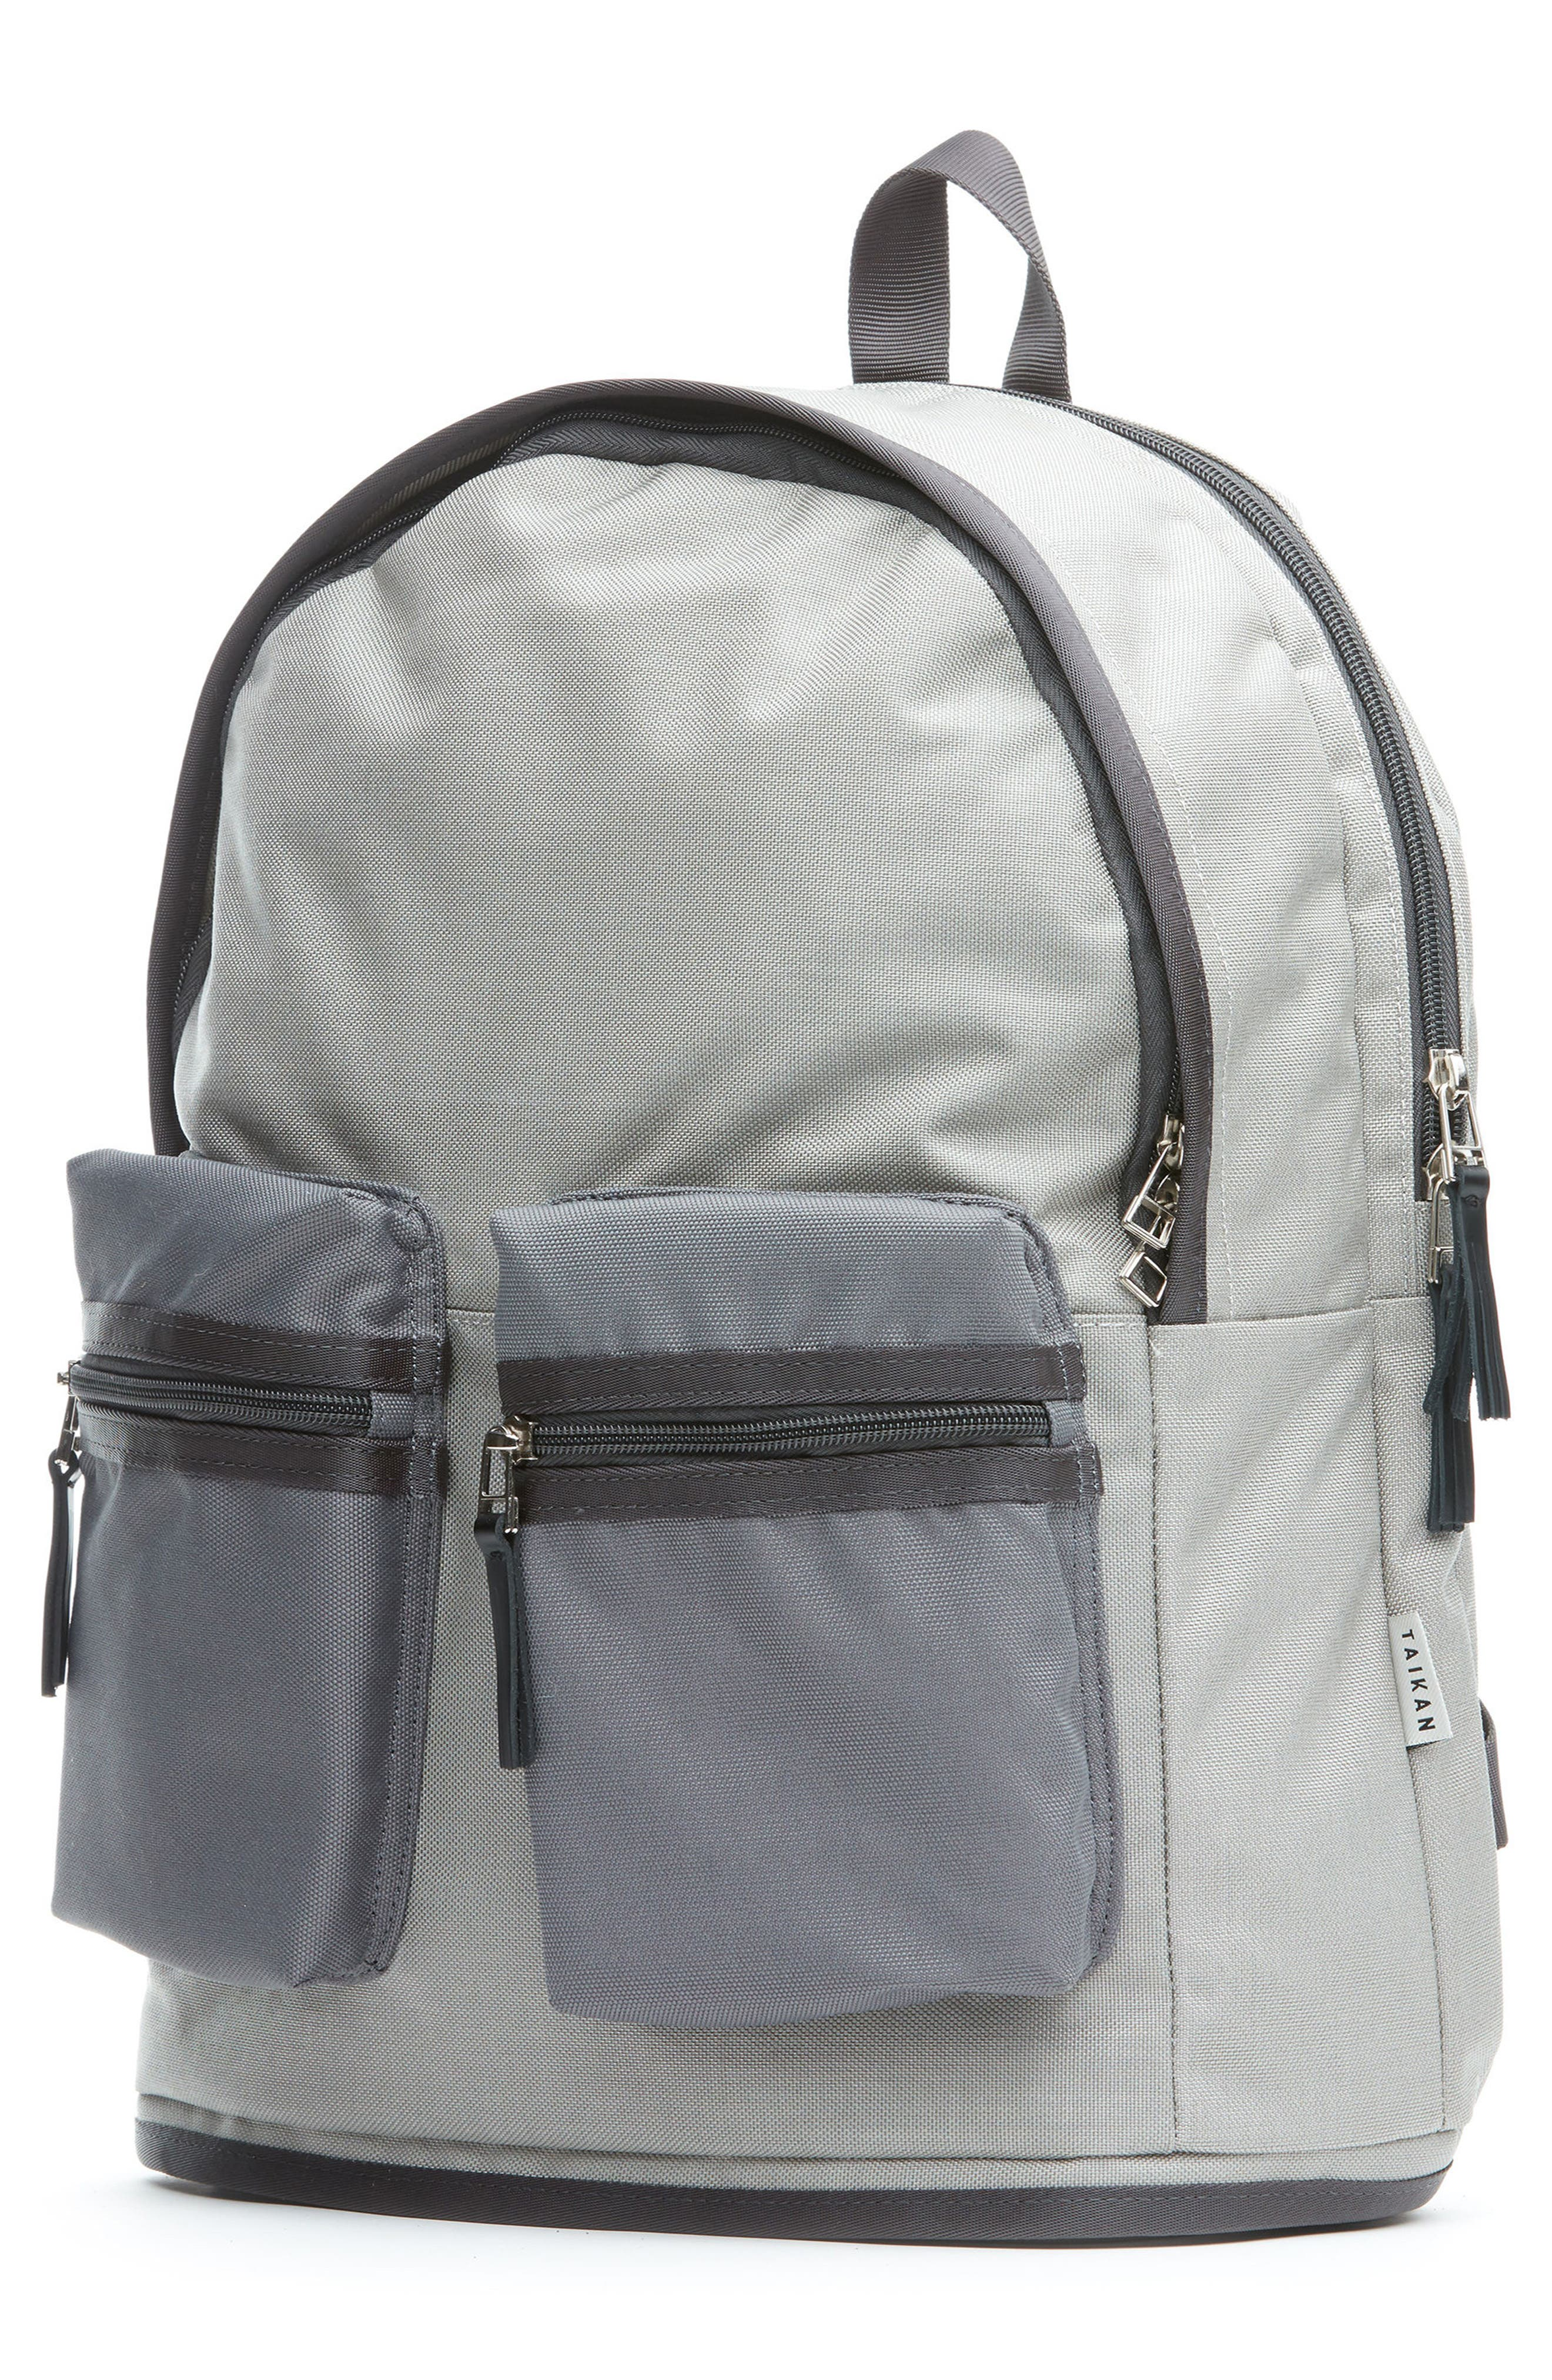 TAIKAN,                             Spartan Backpack,                             Alternate thumbnail 4, color,                             GREY/ GREY